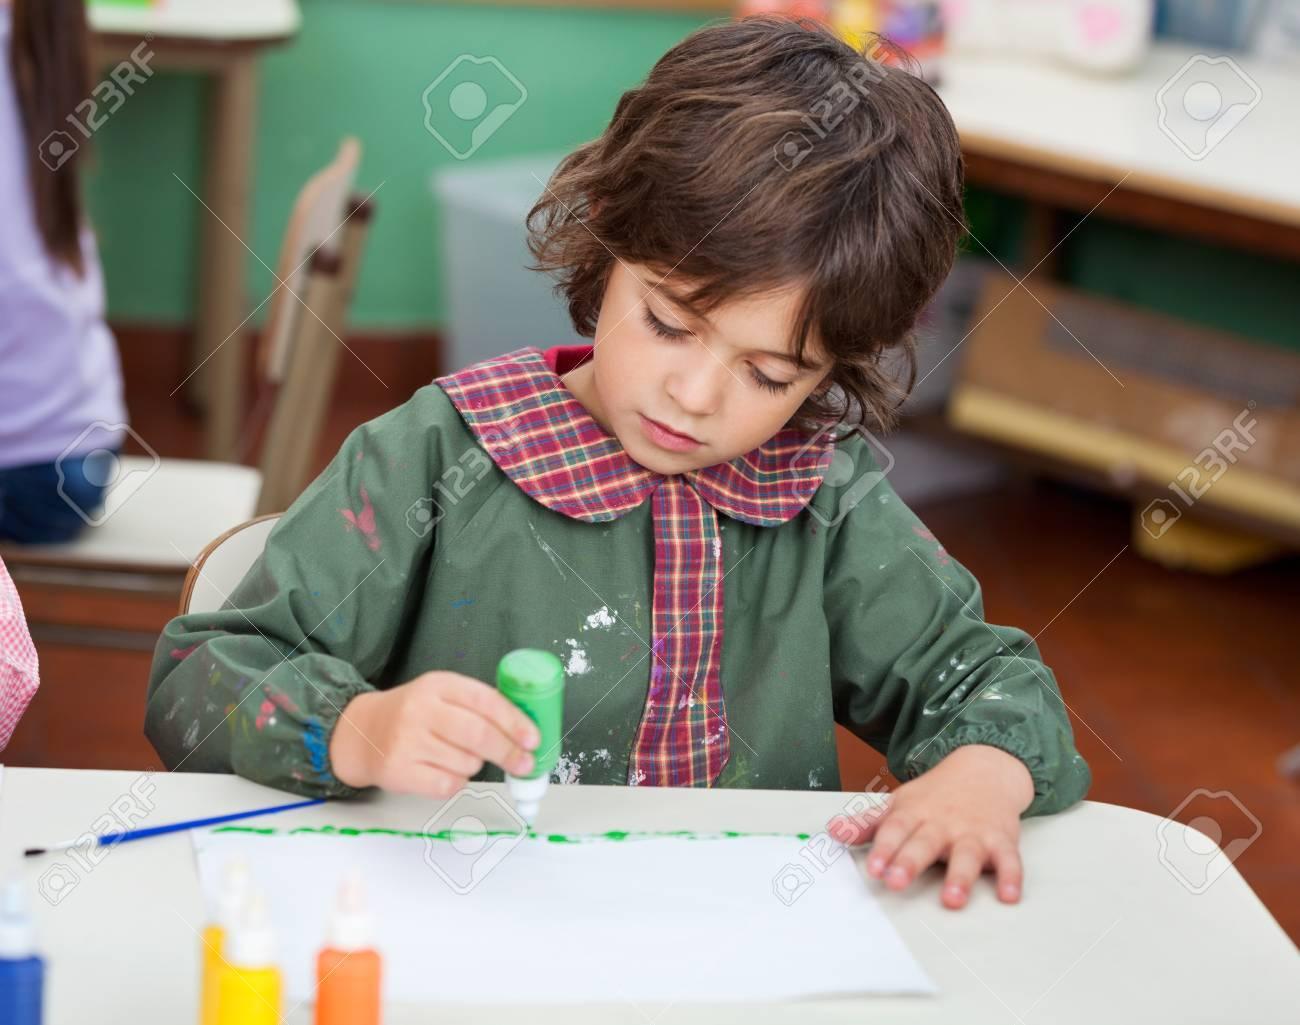 Little Boy Drawing In Art Class Stock Photo - 19938048